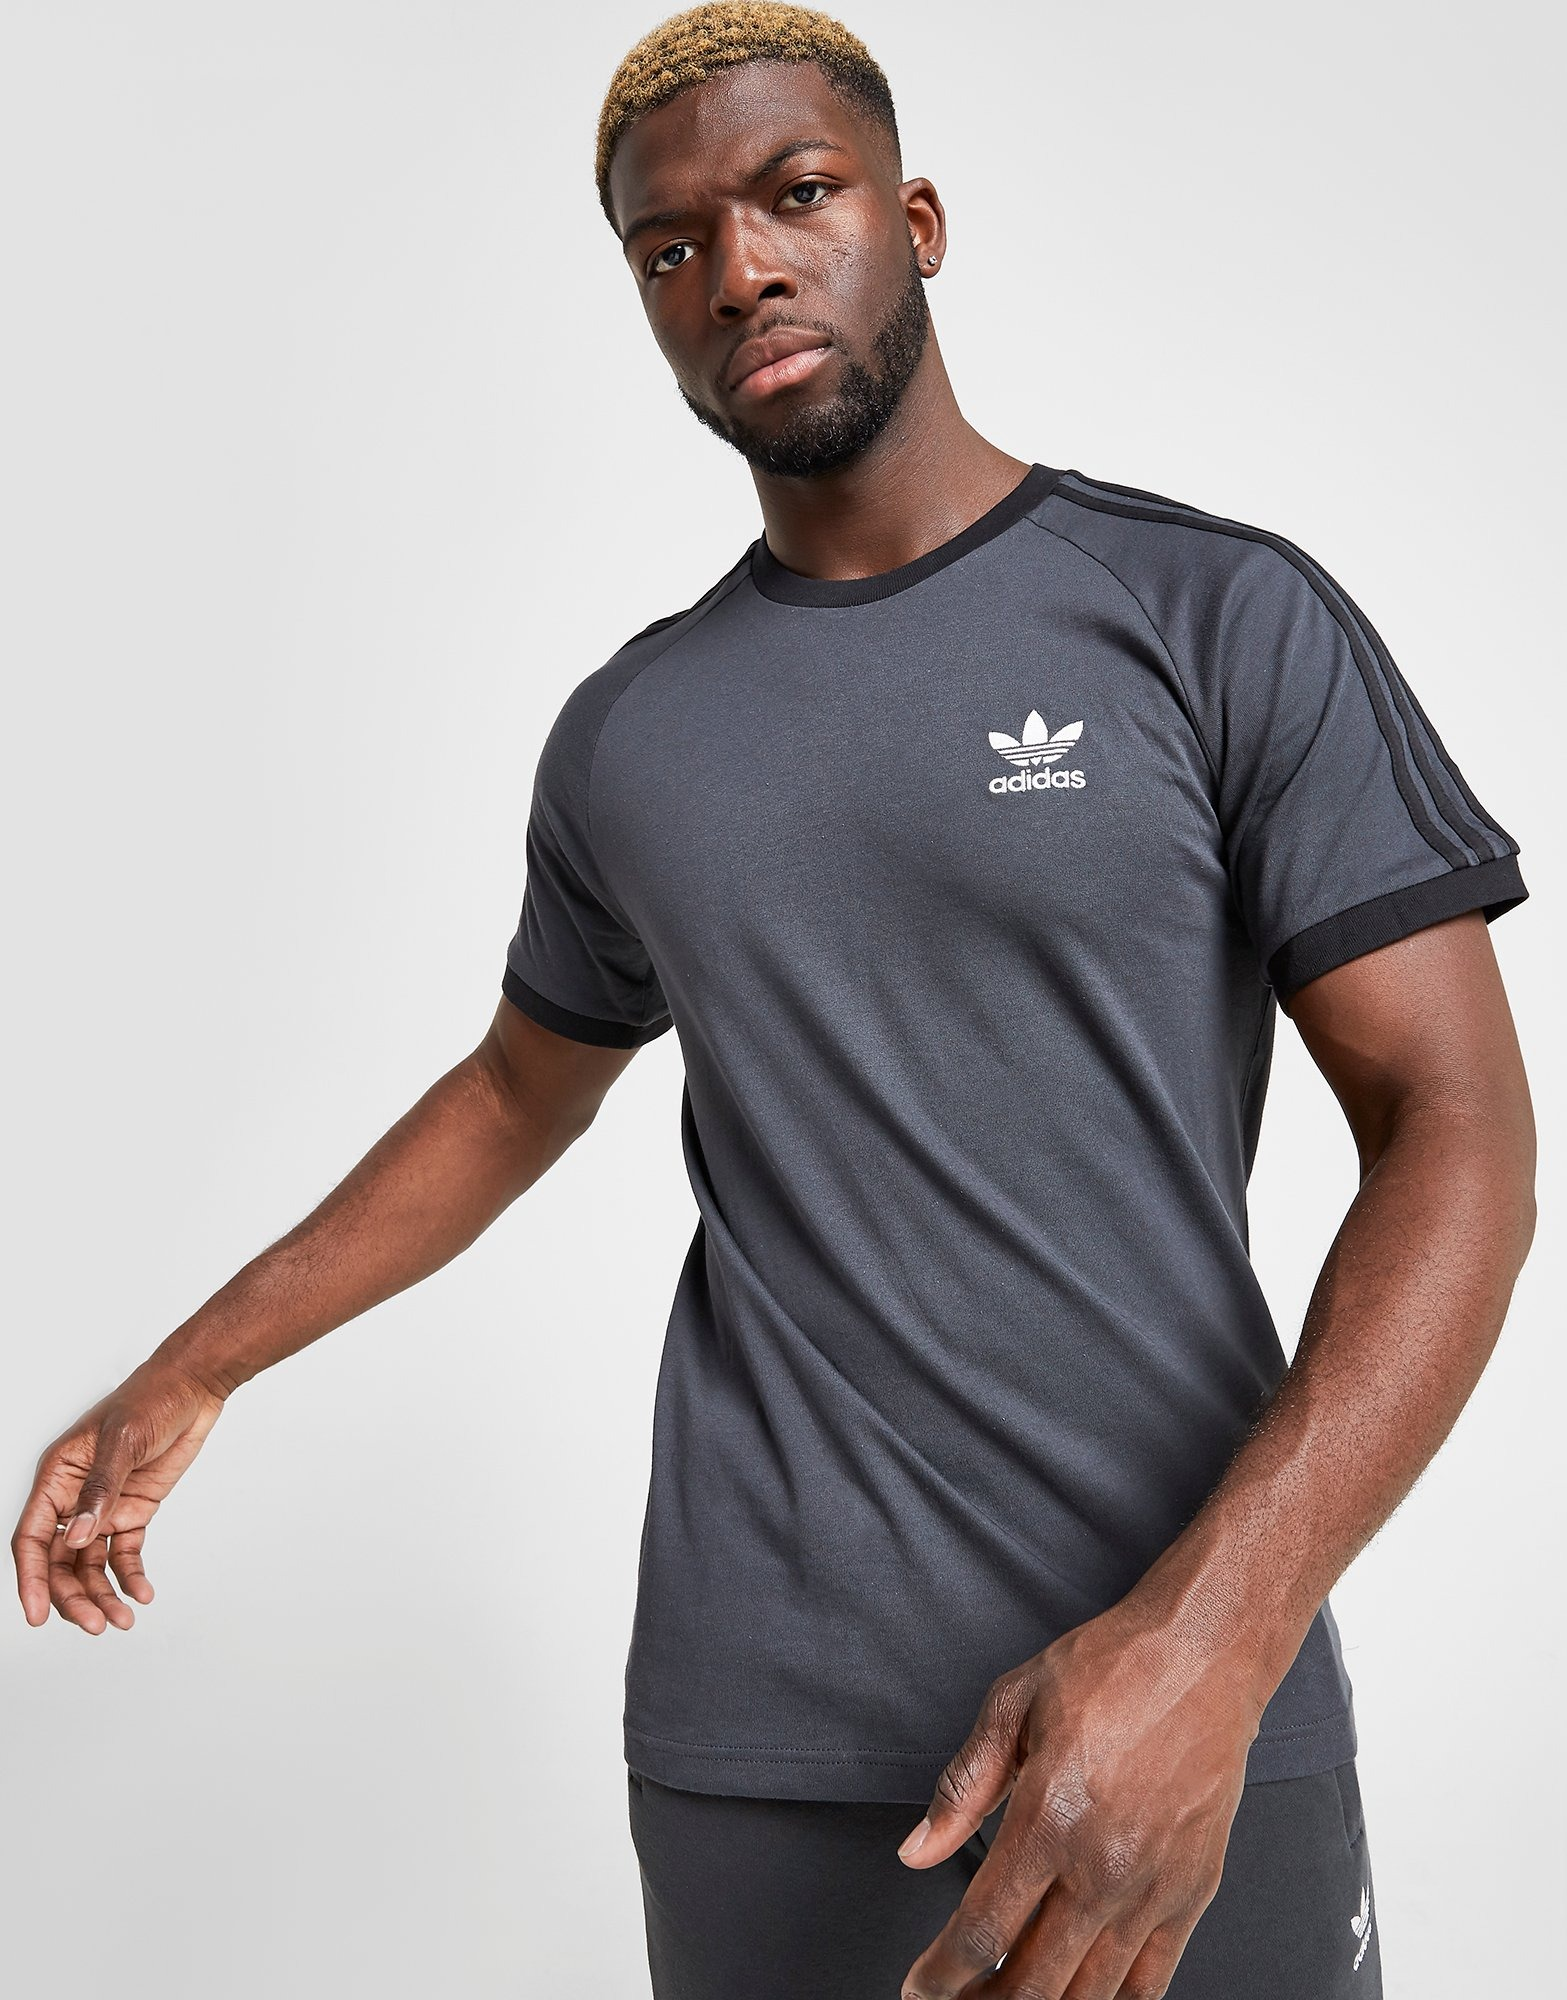 adidas Originals T Shirt 3 Stripes California Manches Courtes Homme | JD Sports